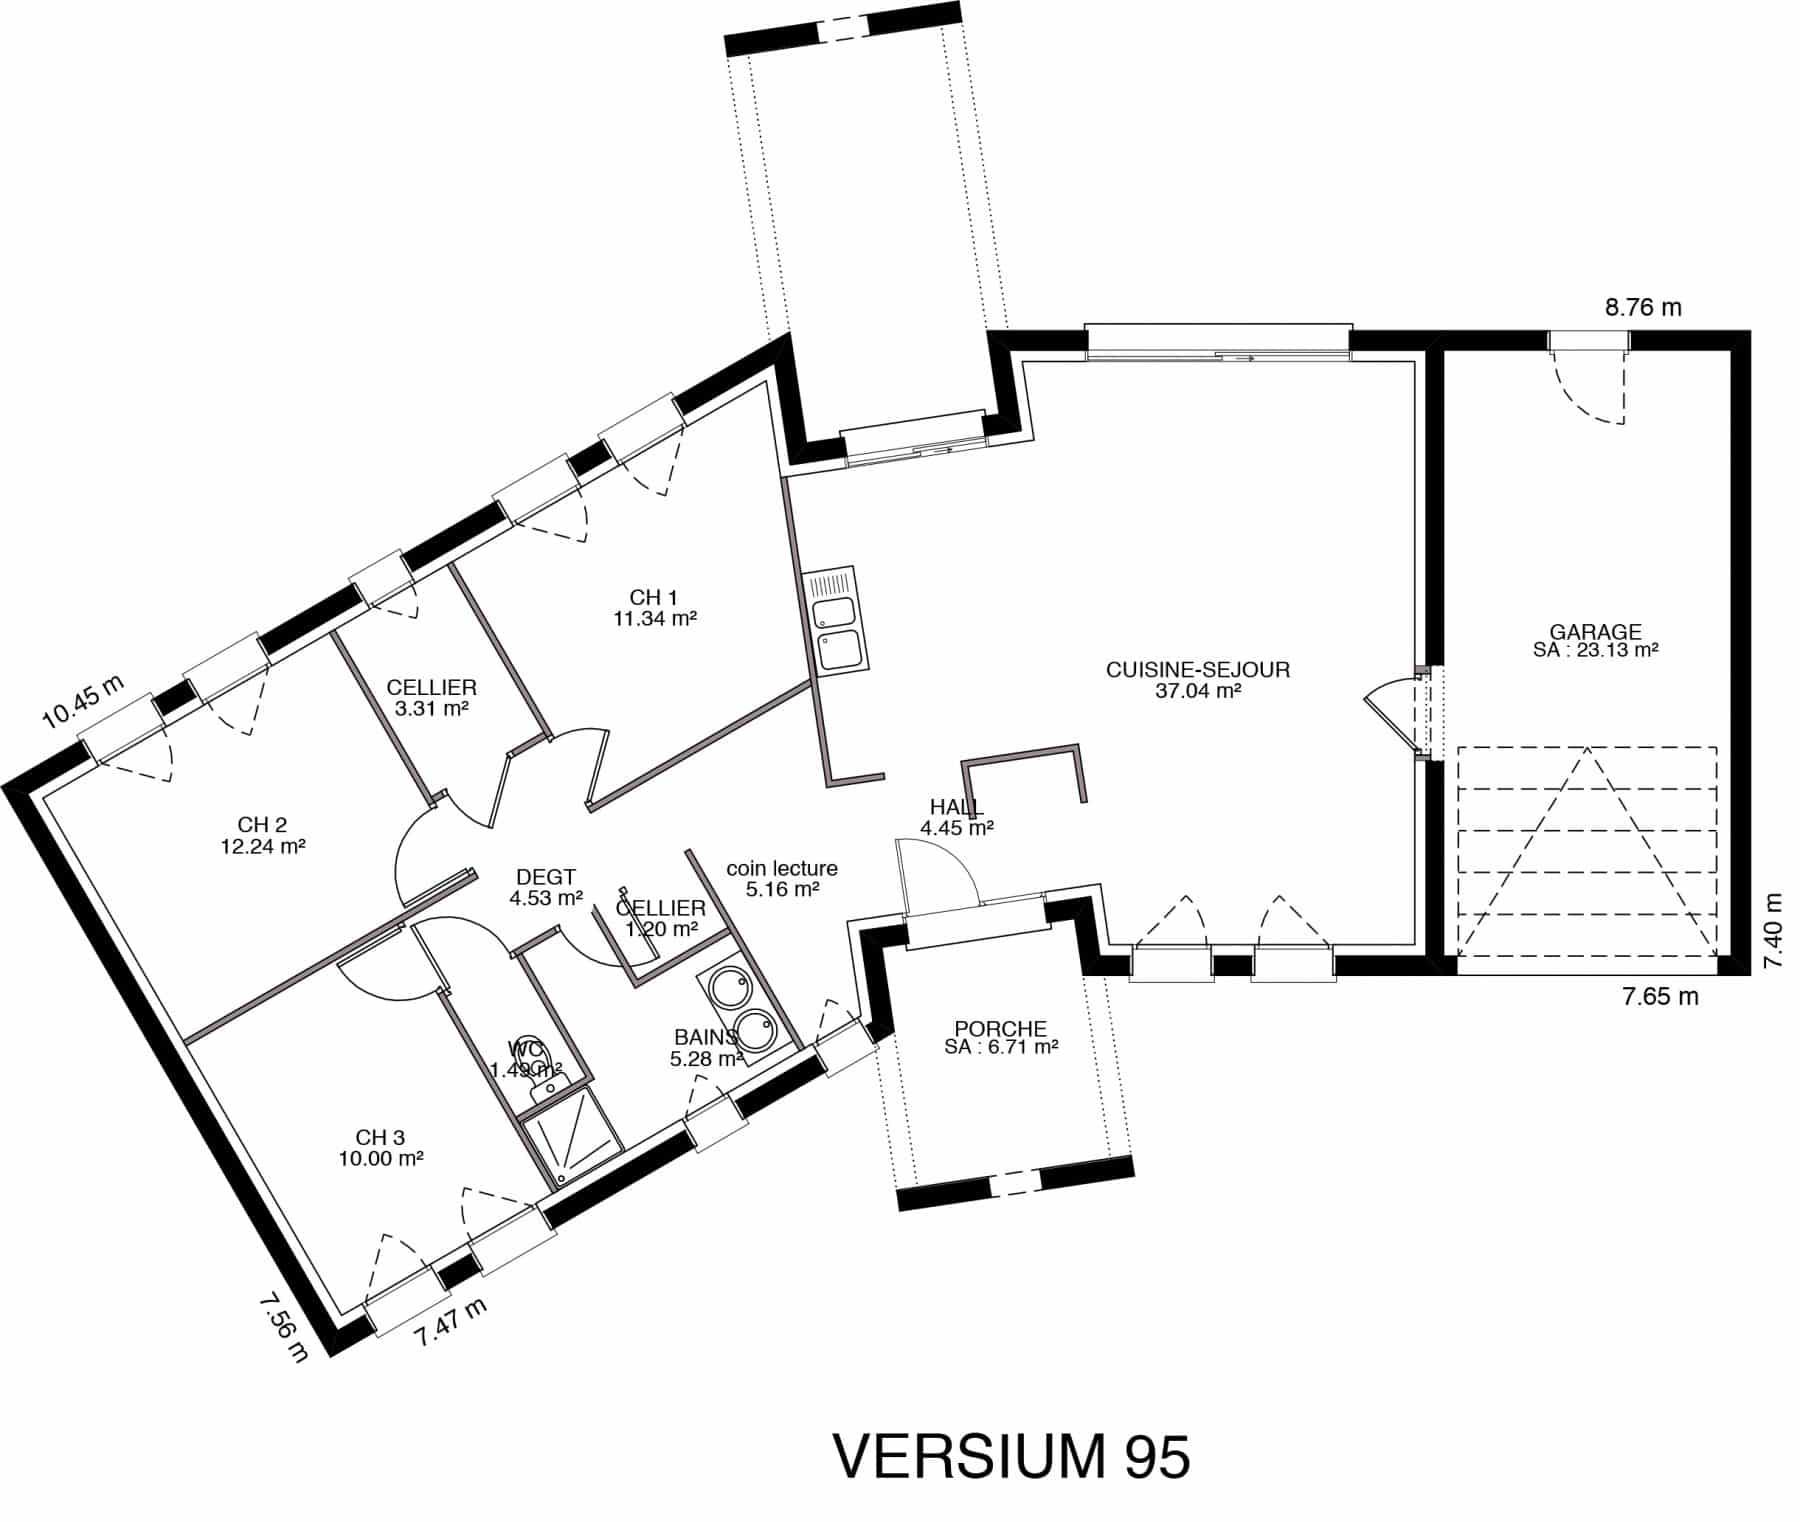 Plan Maison 4 Chambres 130m2 Plan Maison 5